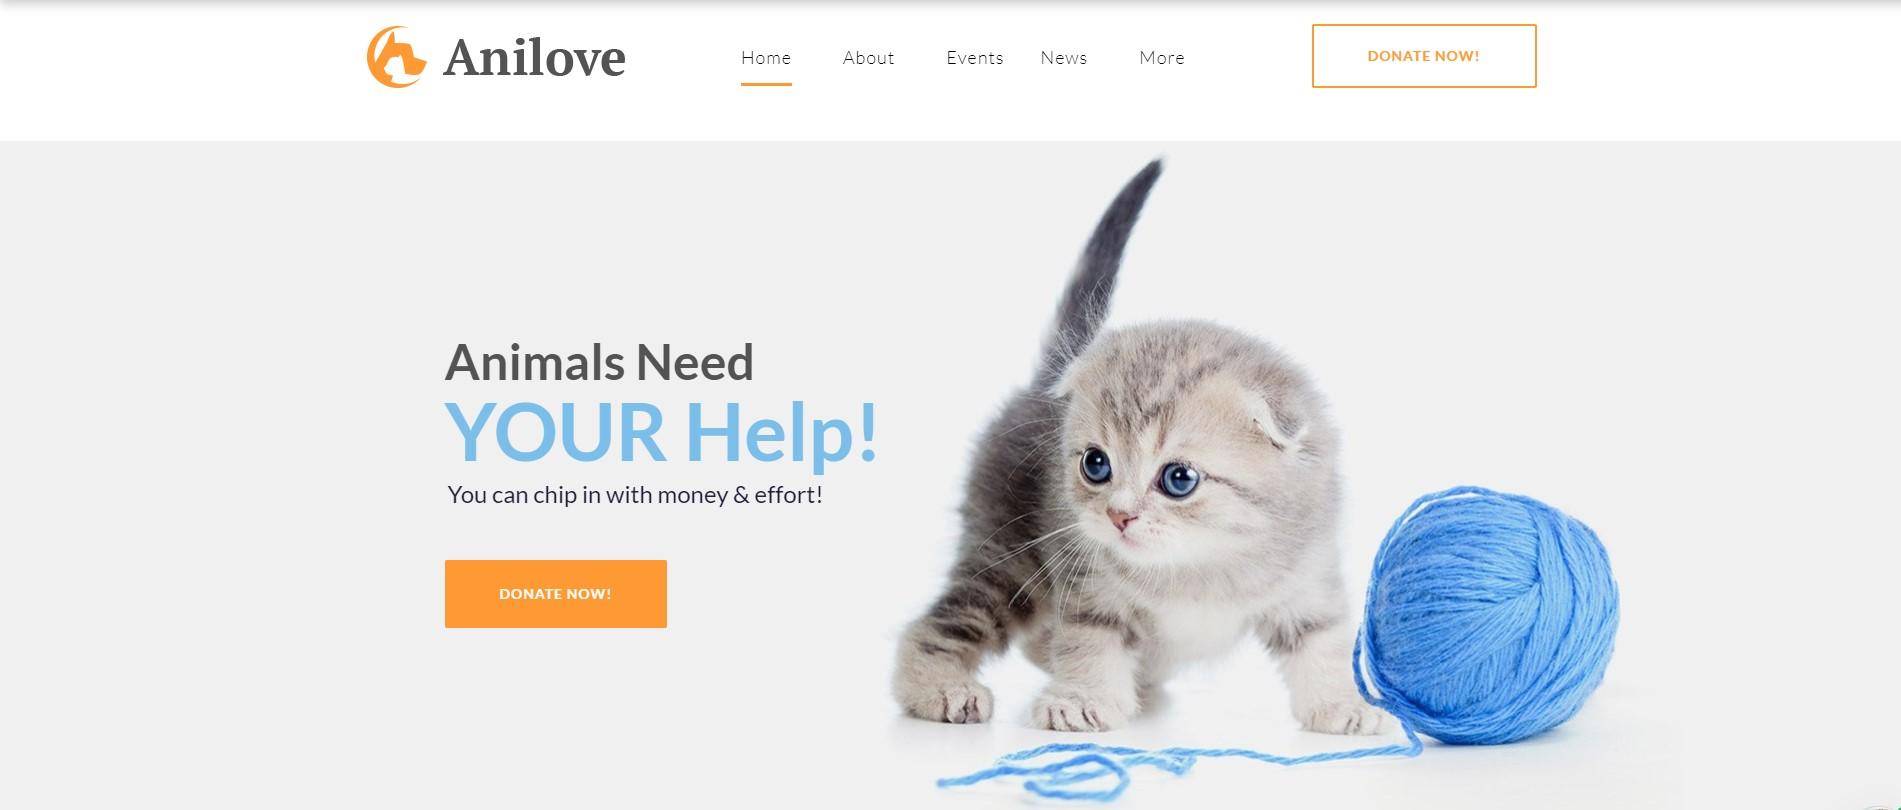 Anilove - Animal Pet Care WordPress Theme